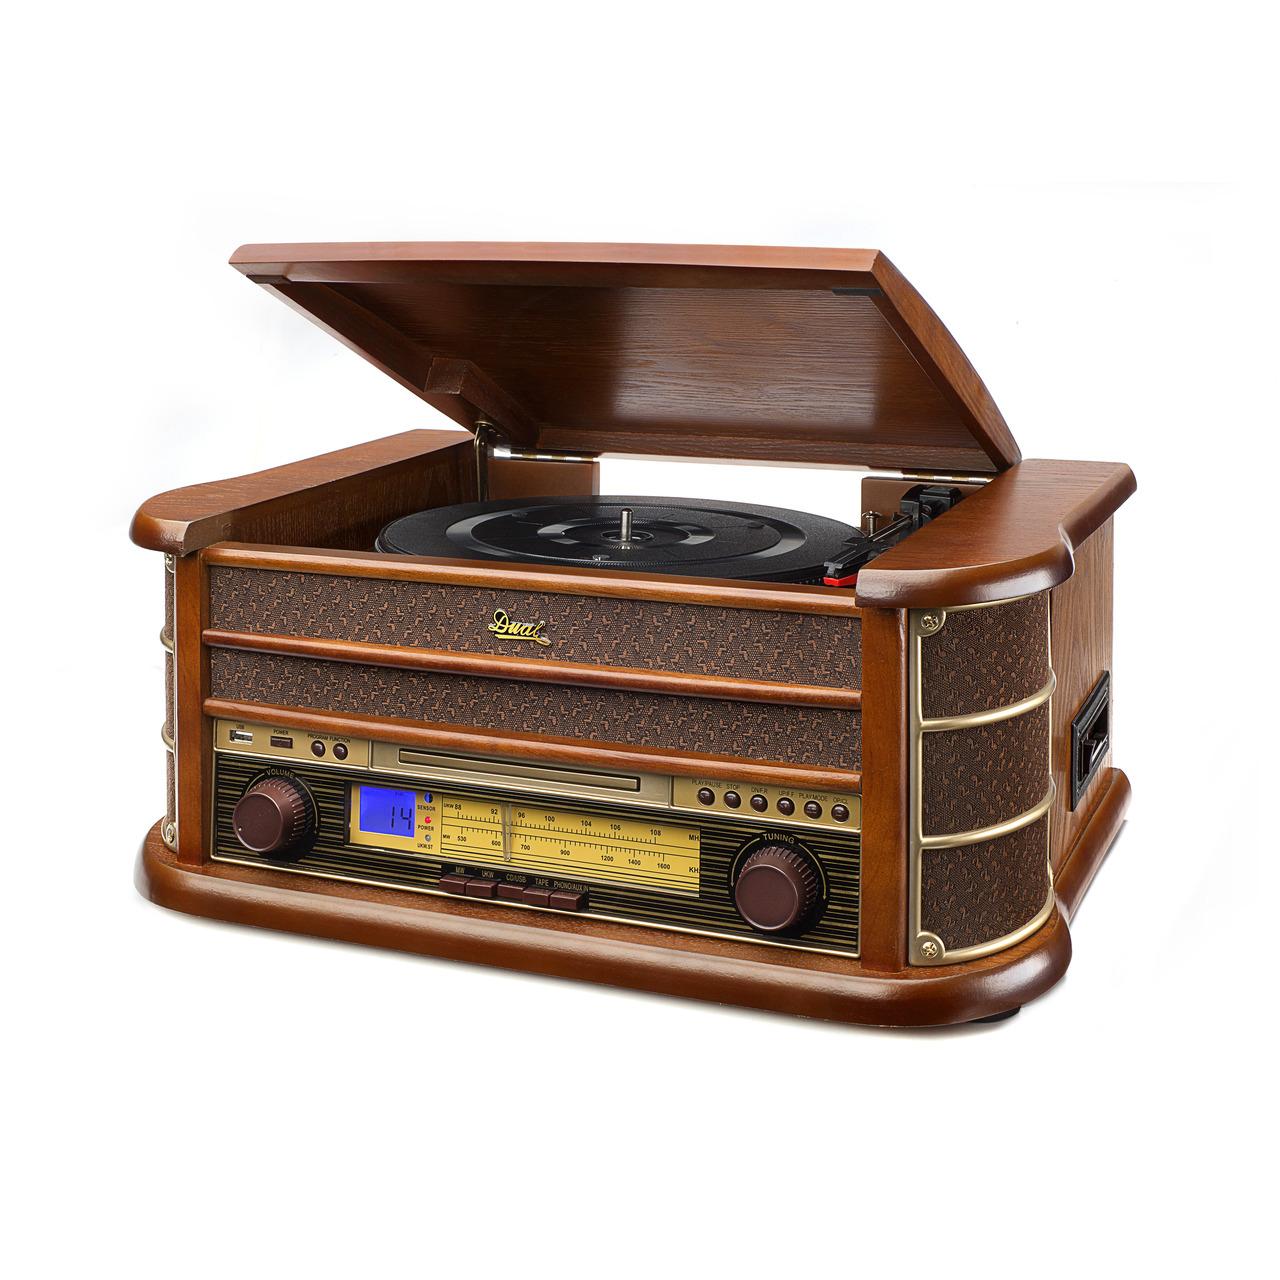 Dual Nostalgie-Stereo-Musikcenter NR 4- UKW-Radio- USB- CD-Player- Kassettenlaufwerk